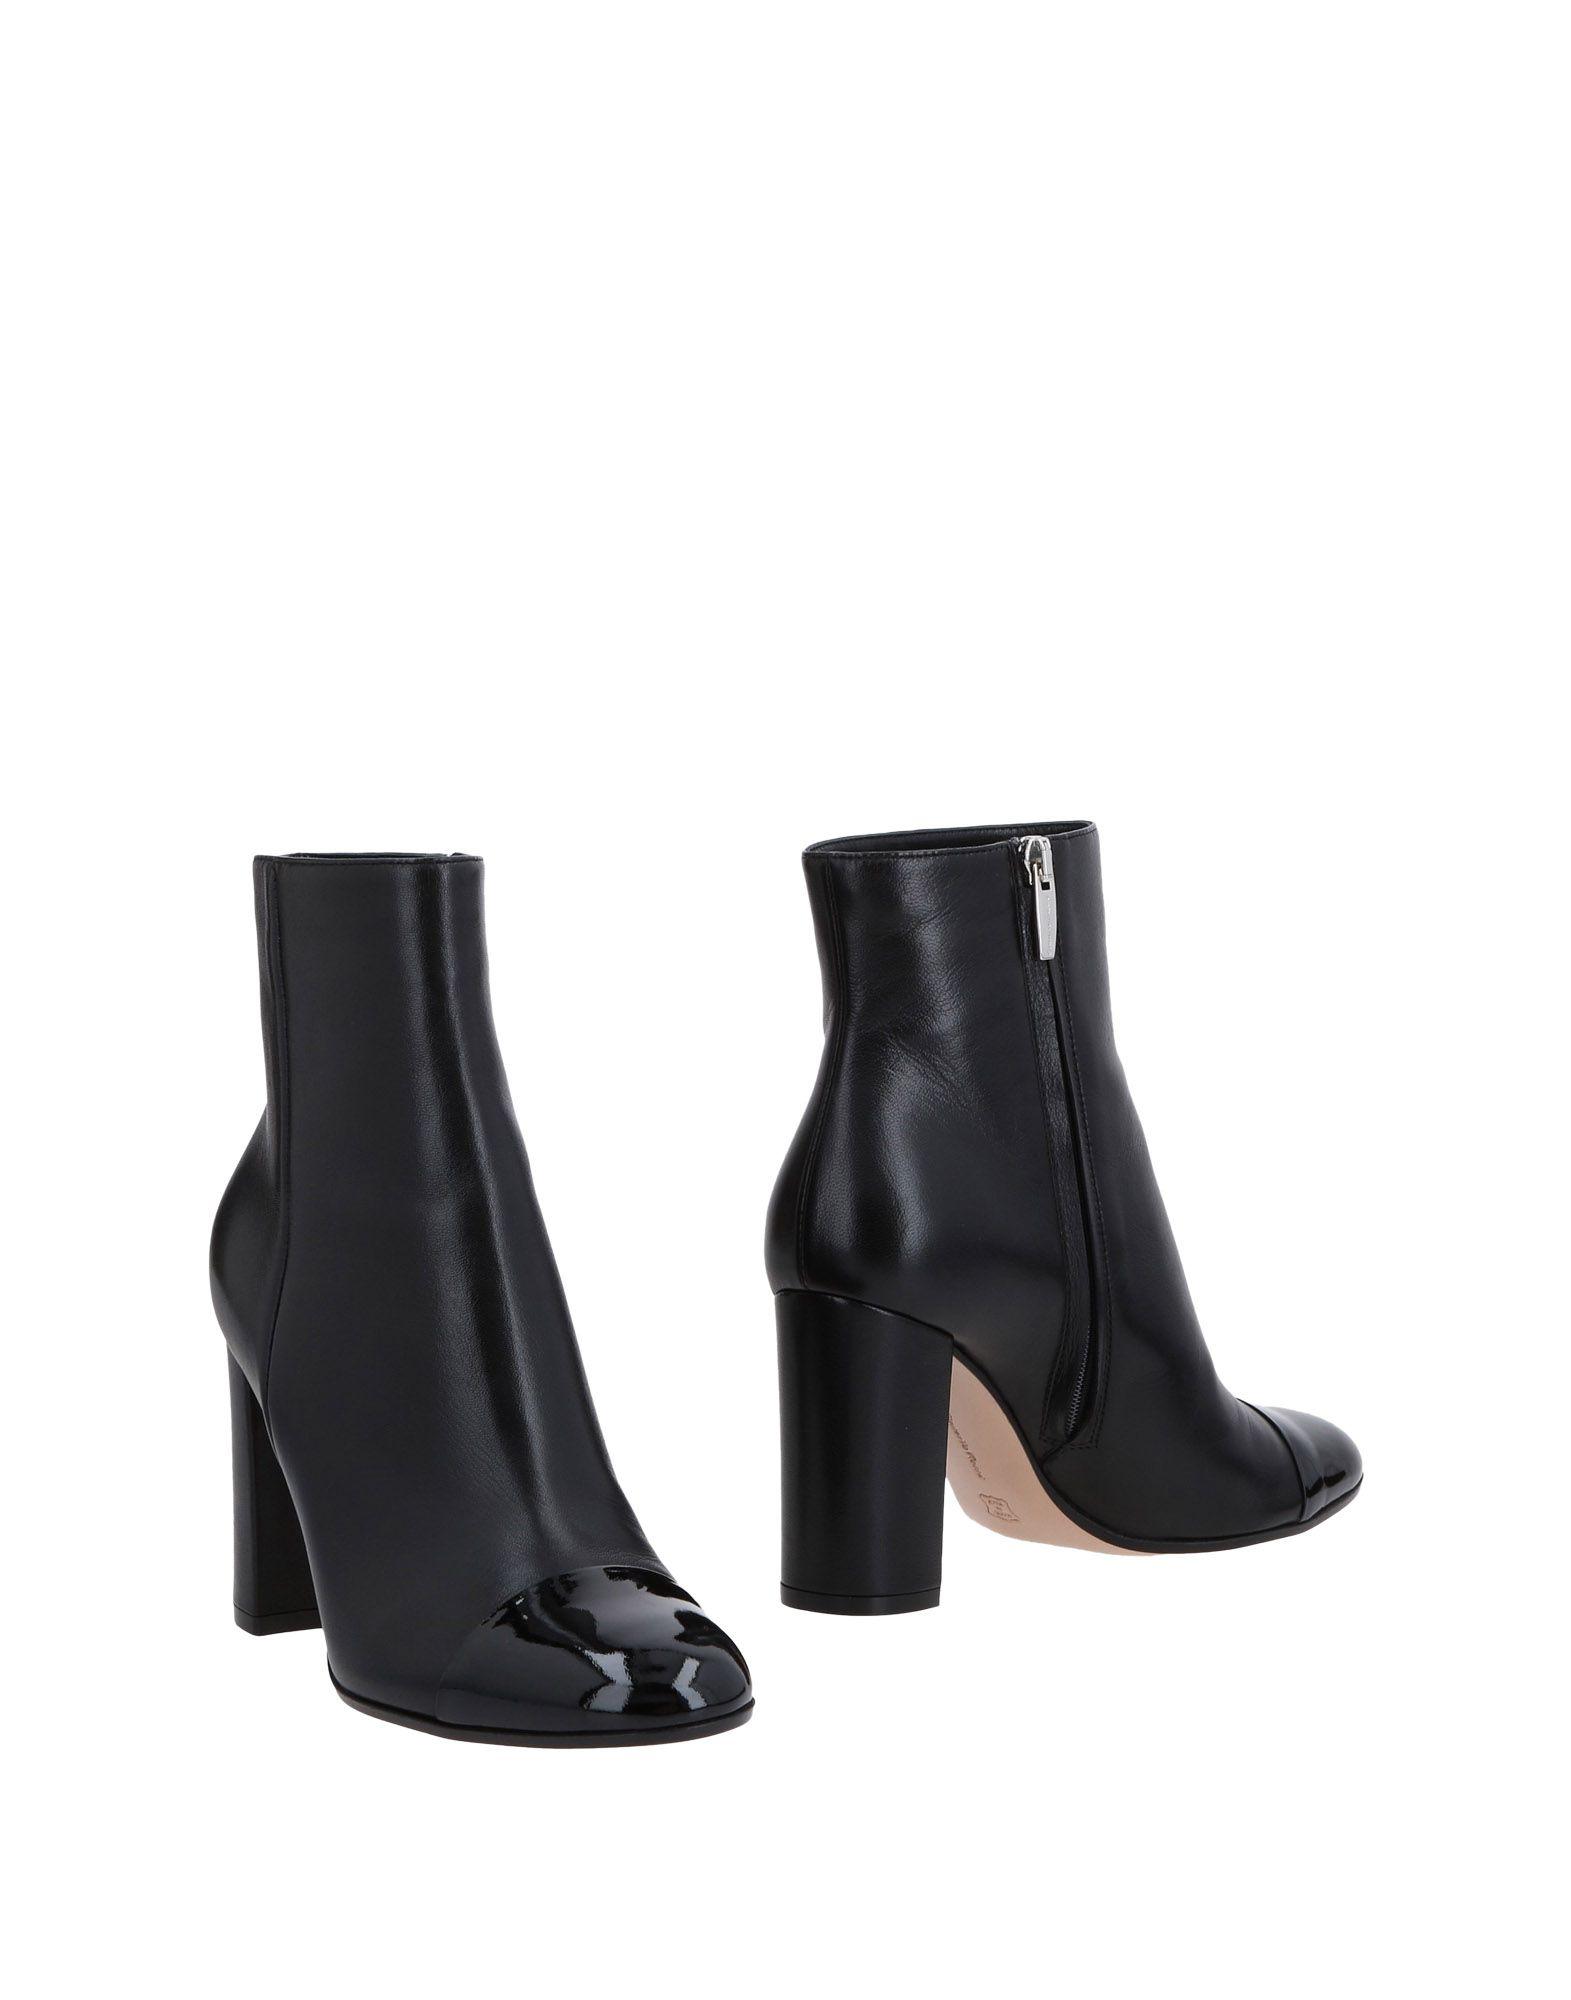 Gianvito Rossi Stiefelette aussehende Damen  11473529ENGünstige gut aussehende Stiefelette Schuhe 9ed0e6